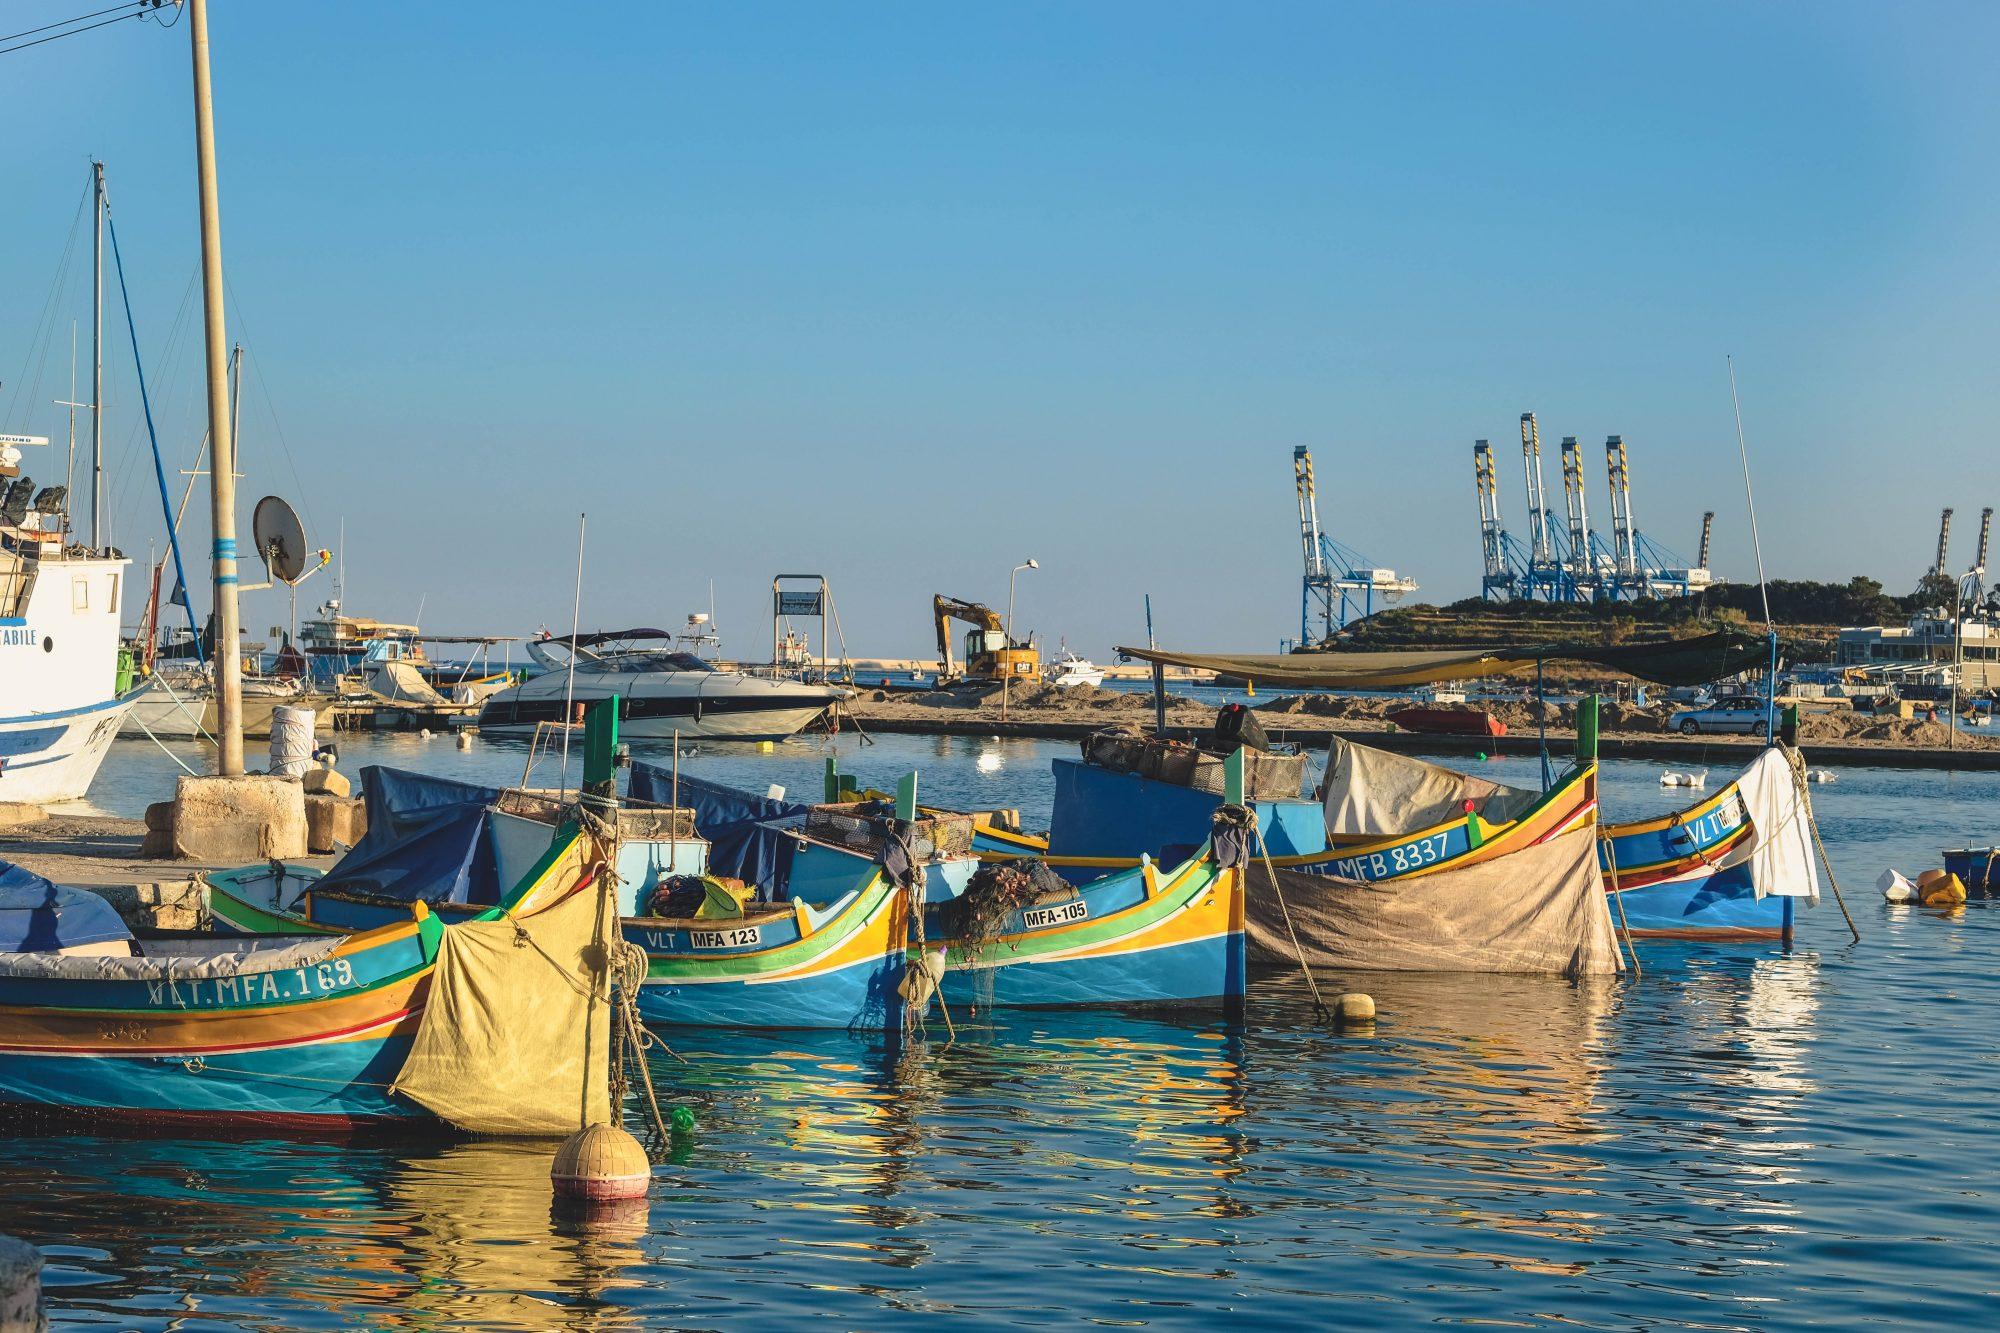 Luzzu Maltais - Marsaxlokk, Malte